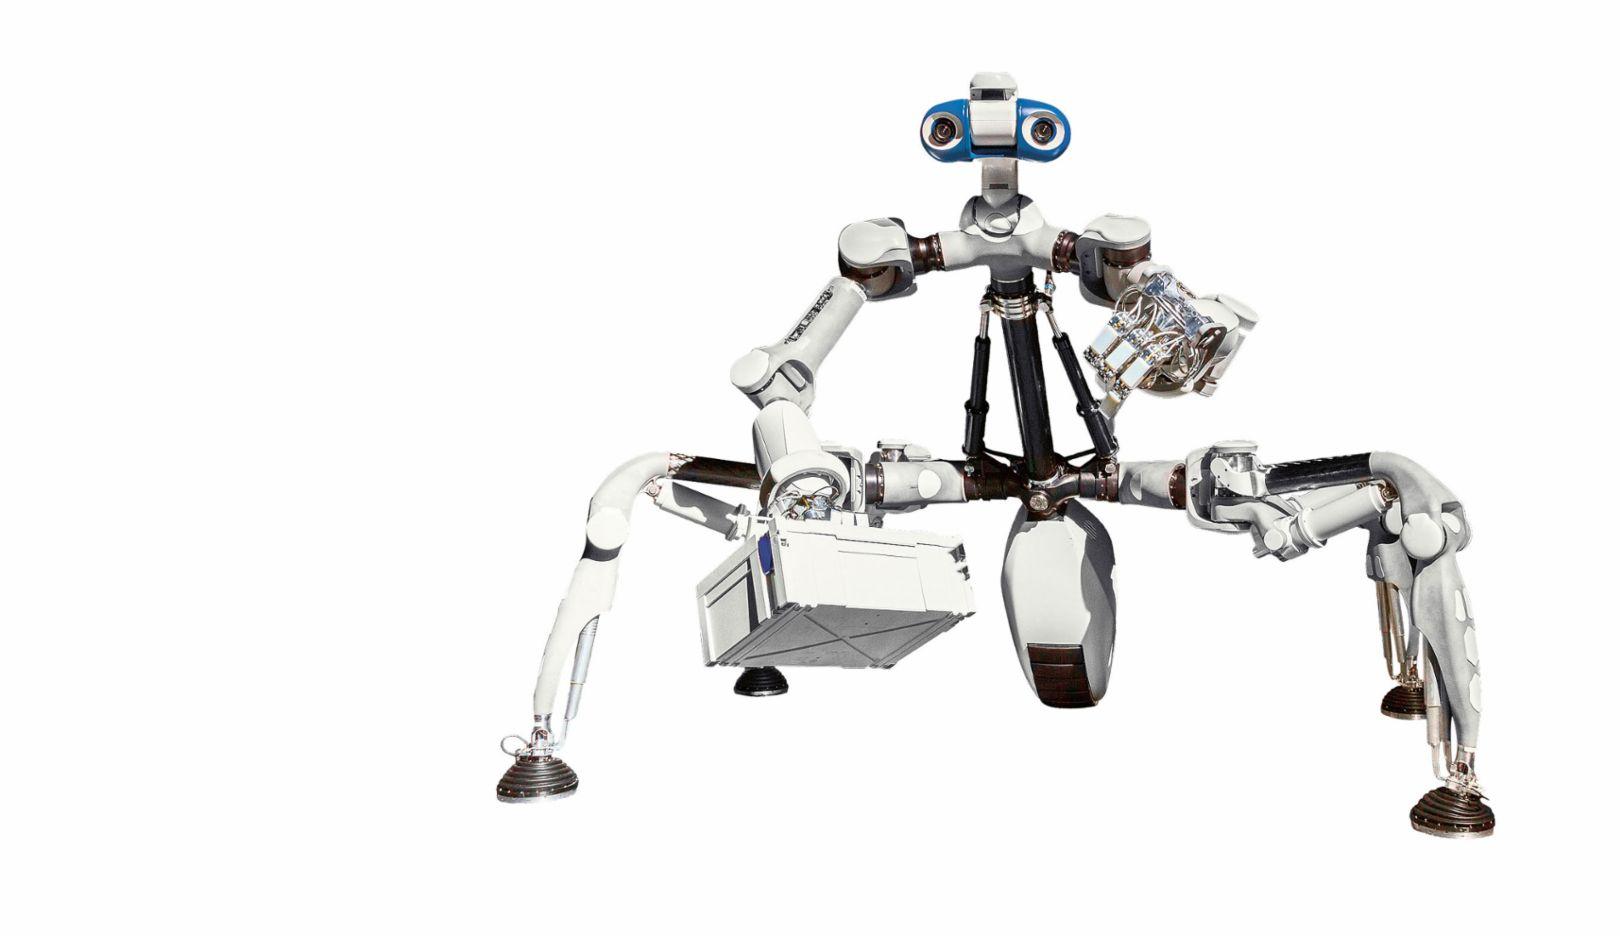 Roboter Mantis, 2019, Porsche Engineering GmbH